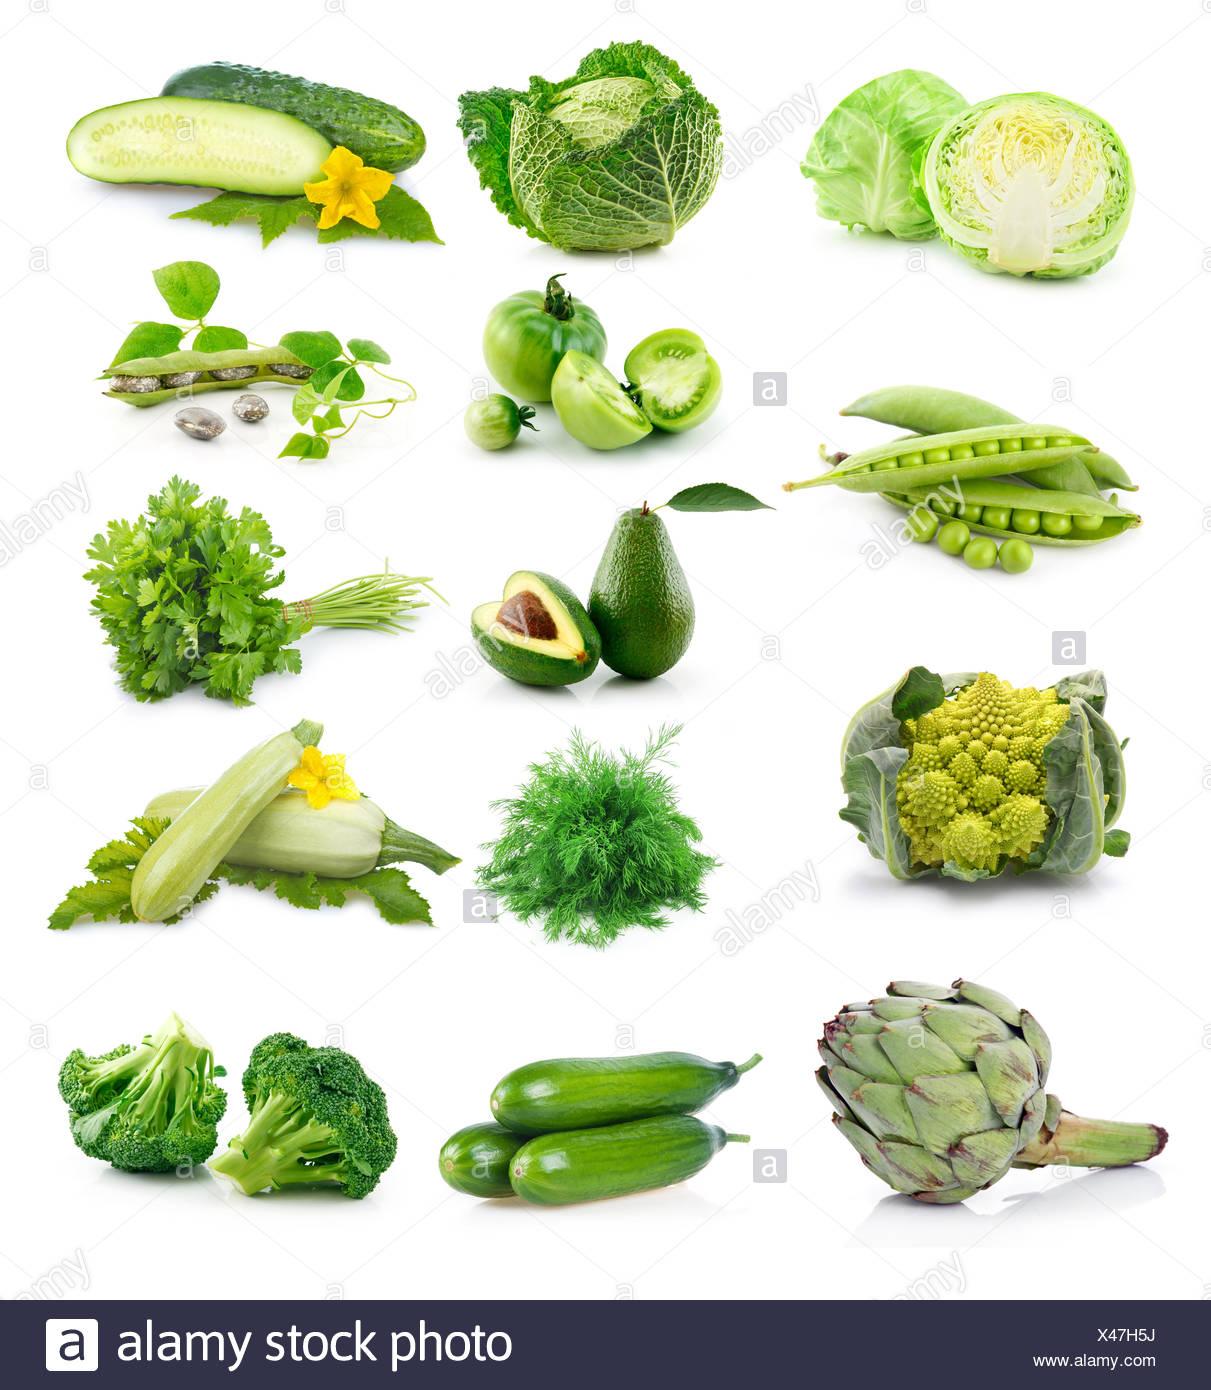 Set of fresh green vegetables isolated on white - Stock Image